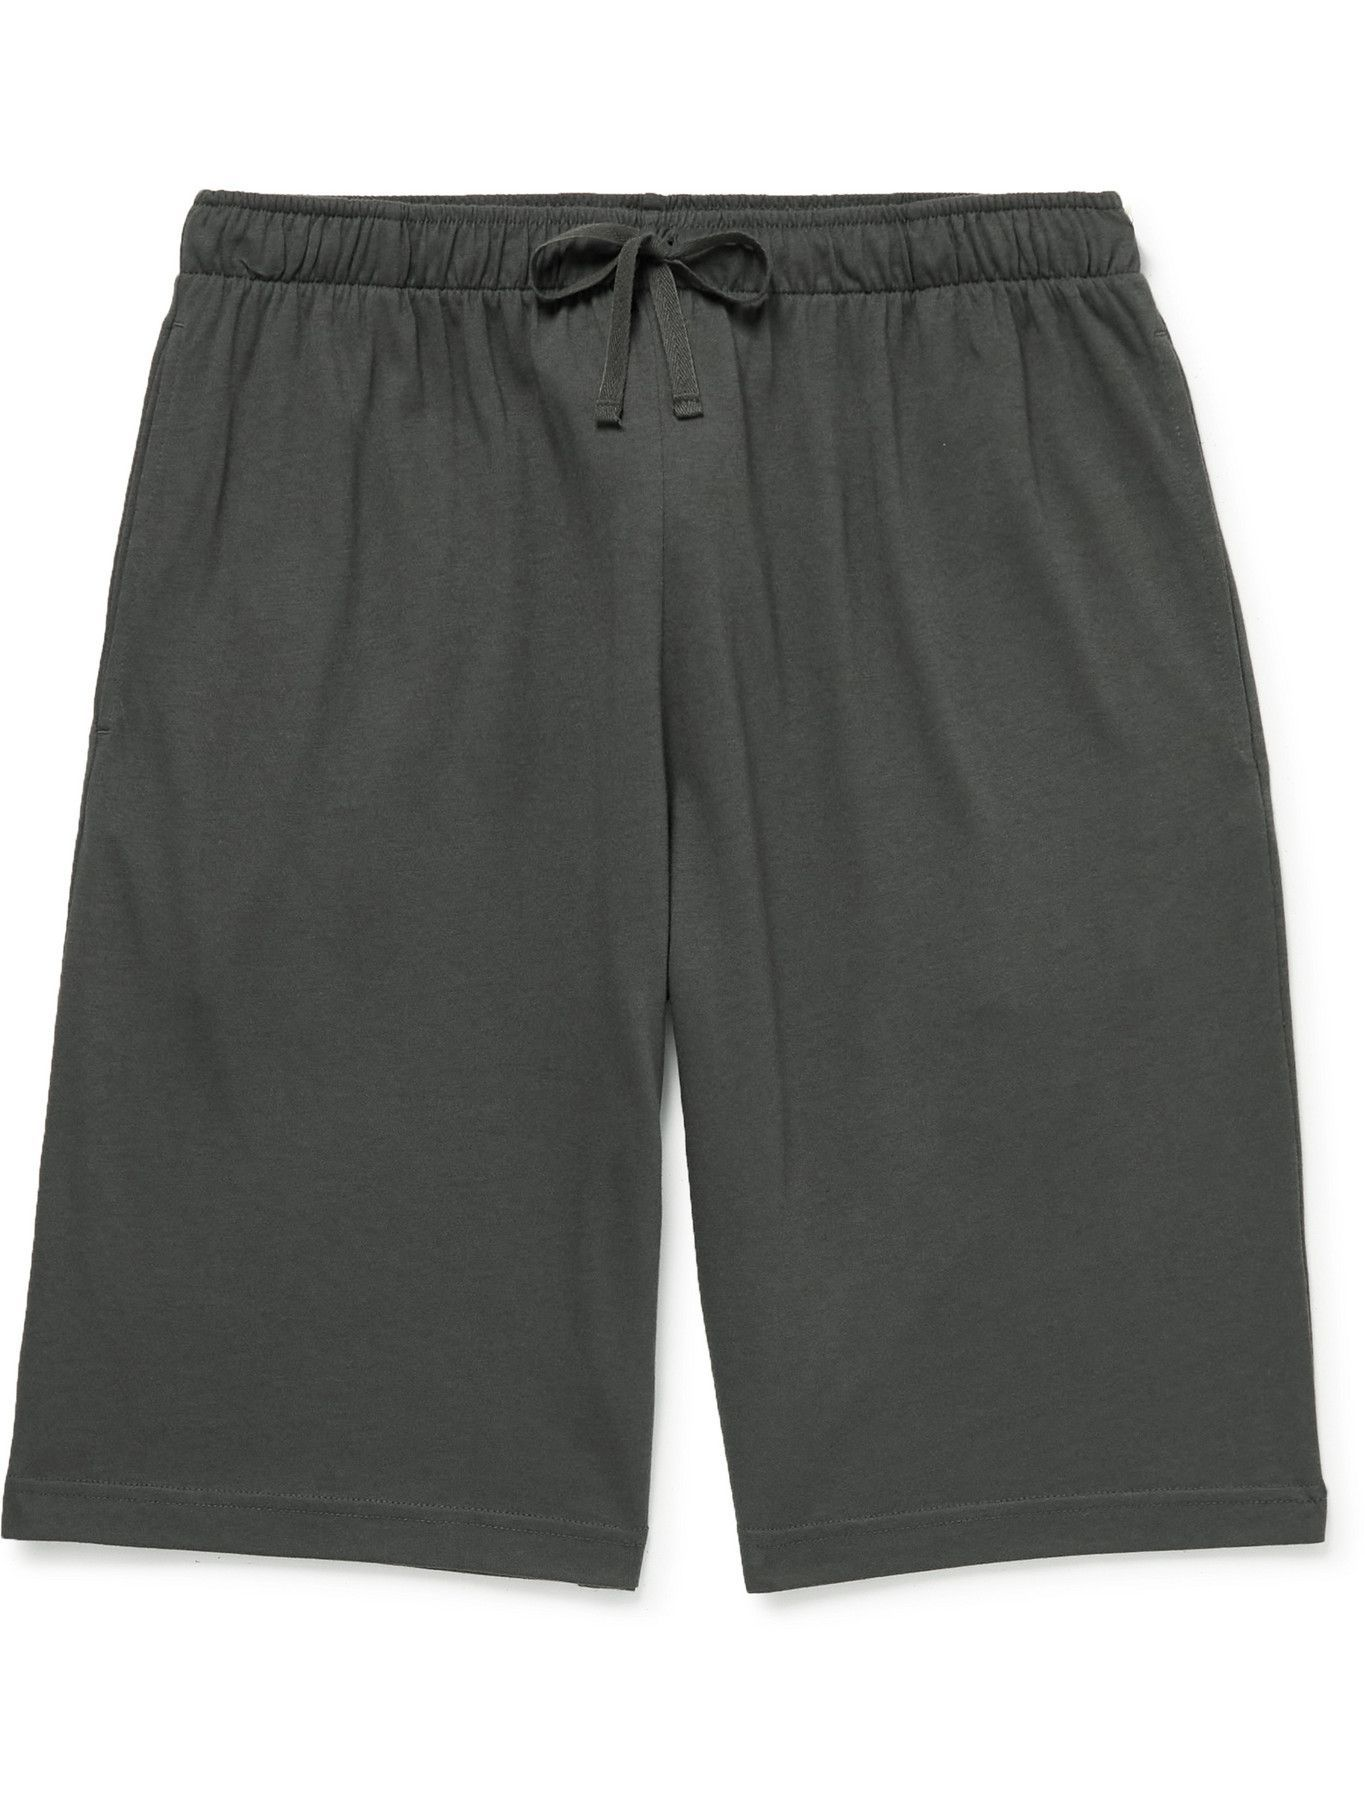 Photo: Sunspel - Lounge Cotton and Modal-Blend Jersey Drawstring Shorts - Gray